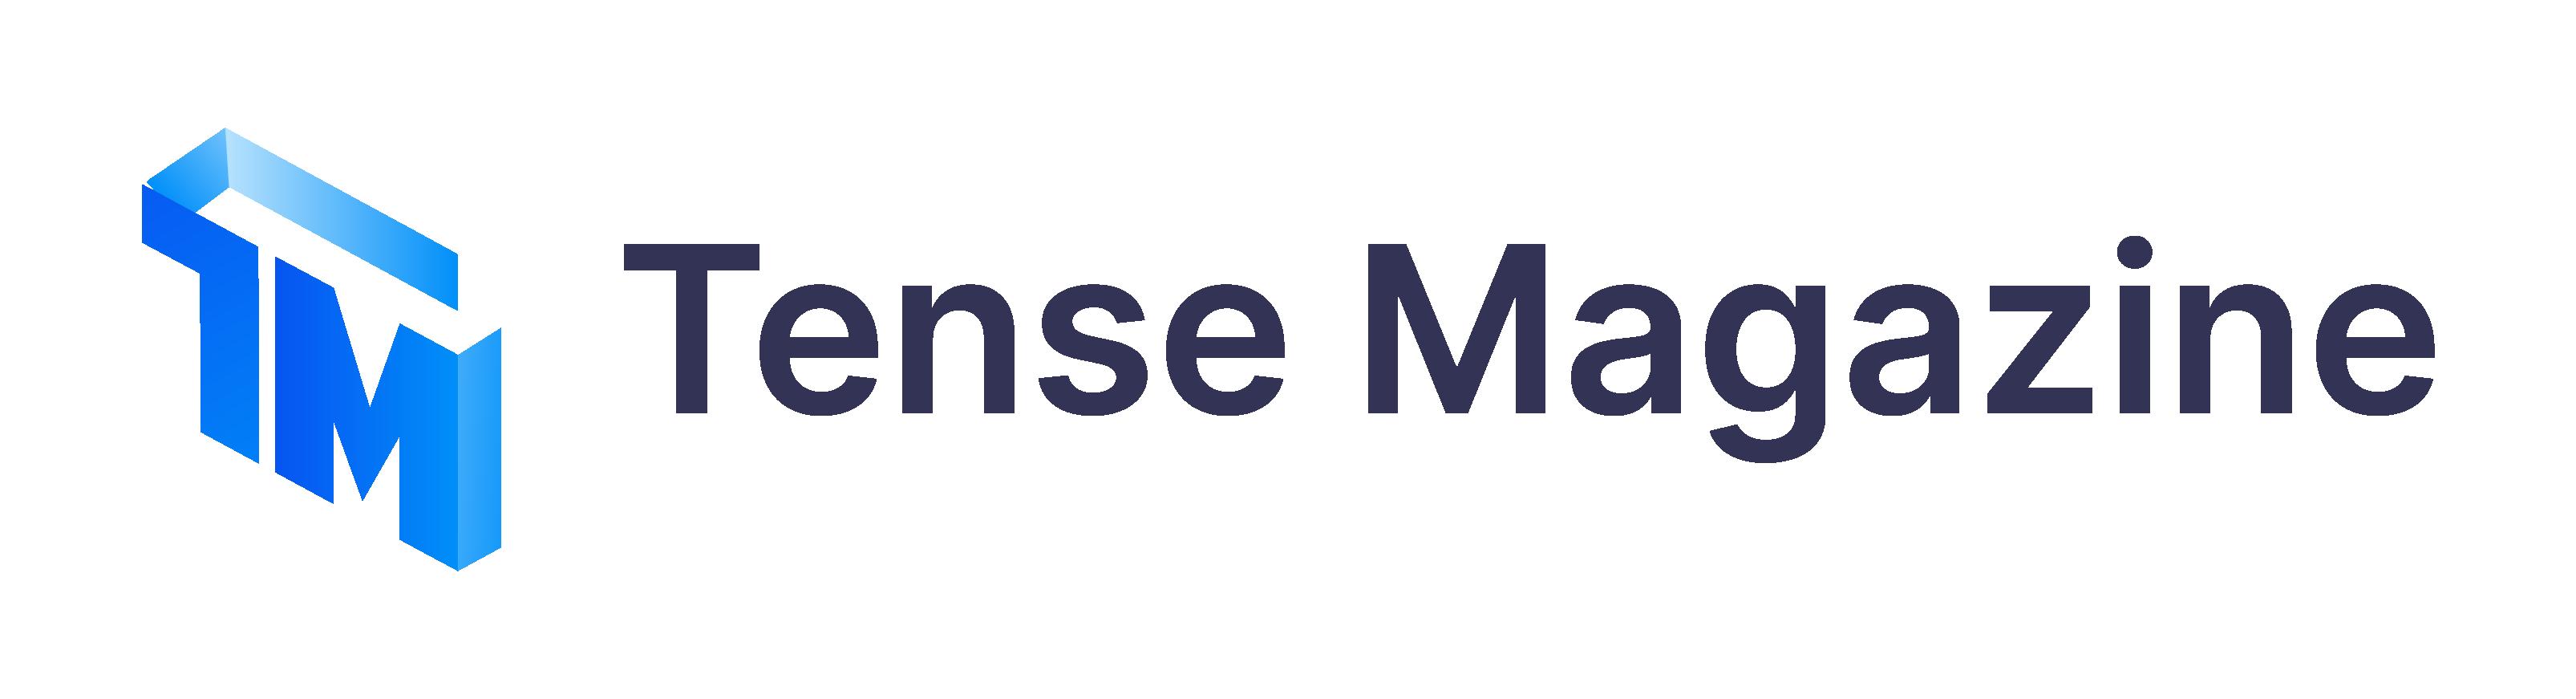 Tense Magazine